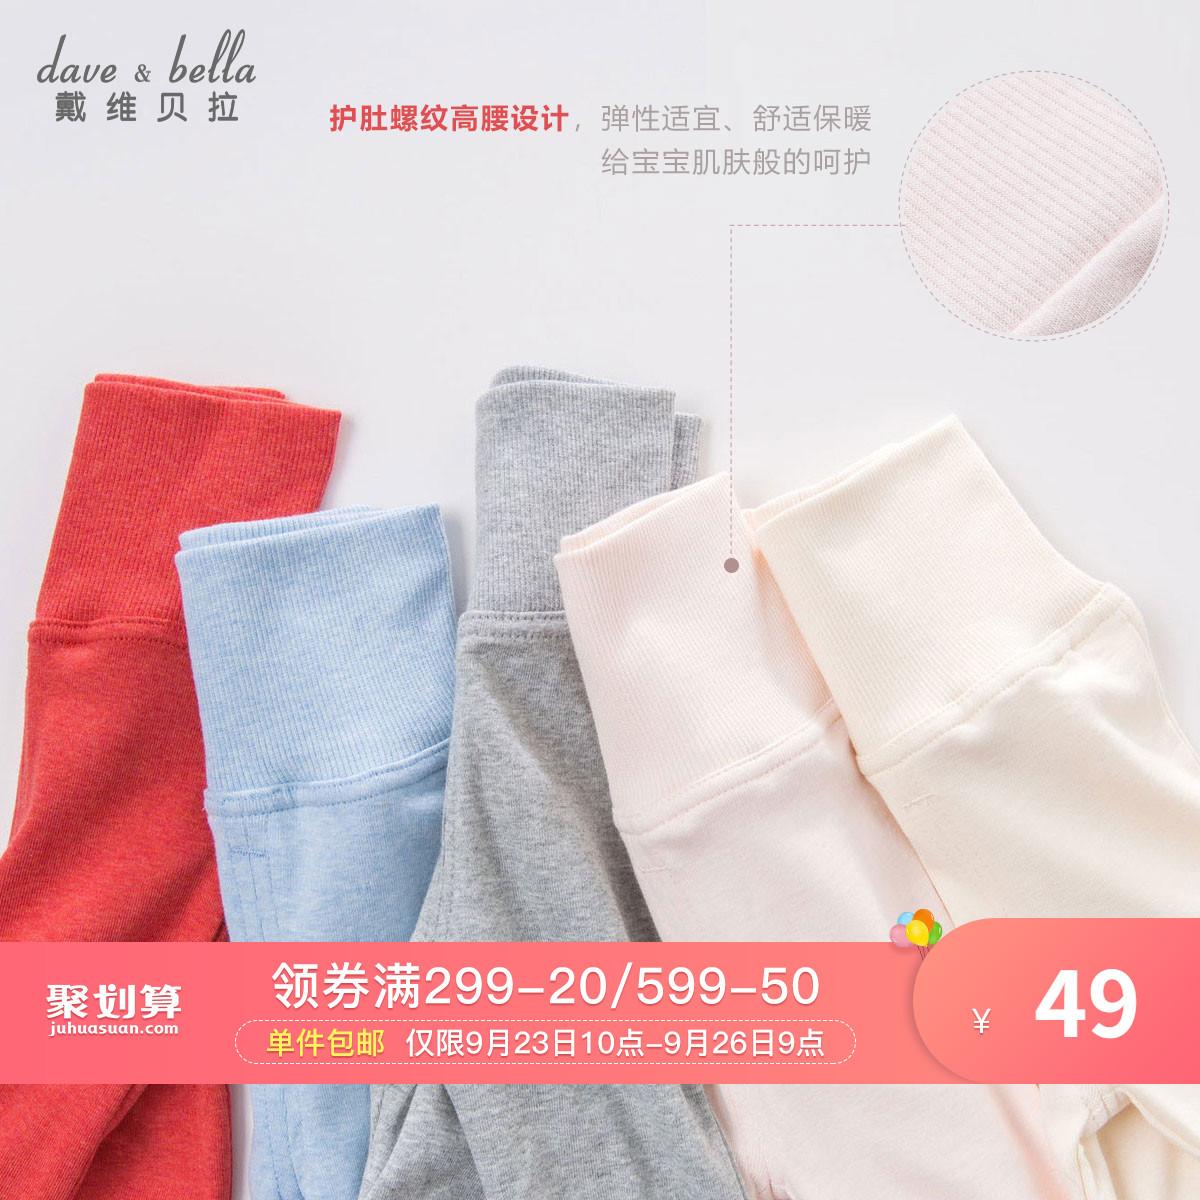 davebella戴维贝拉男女童春秋季婴儿护肚裤 宝宝高腰护肚裤DB2996